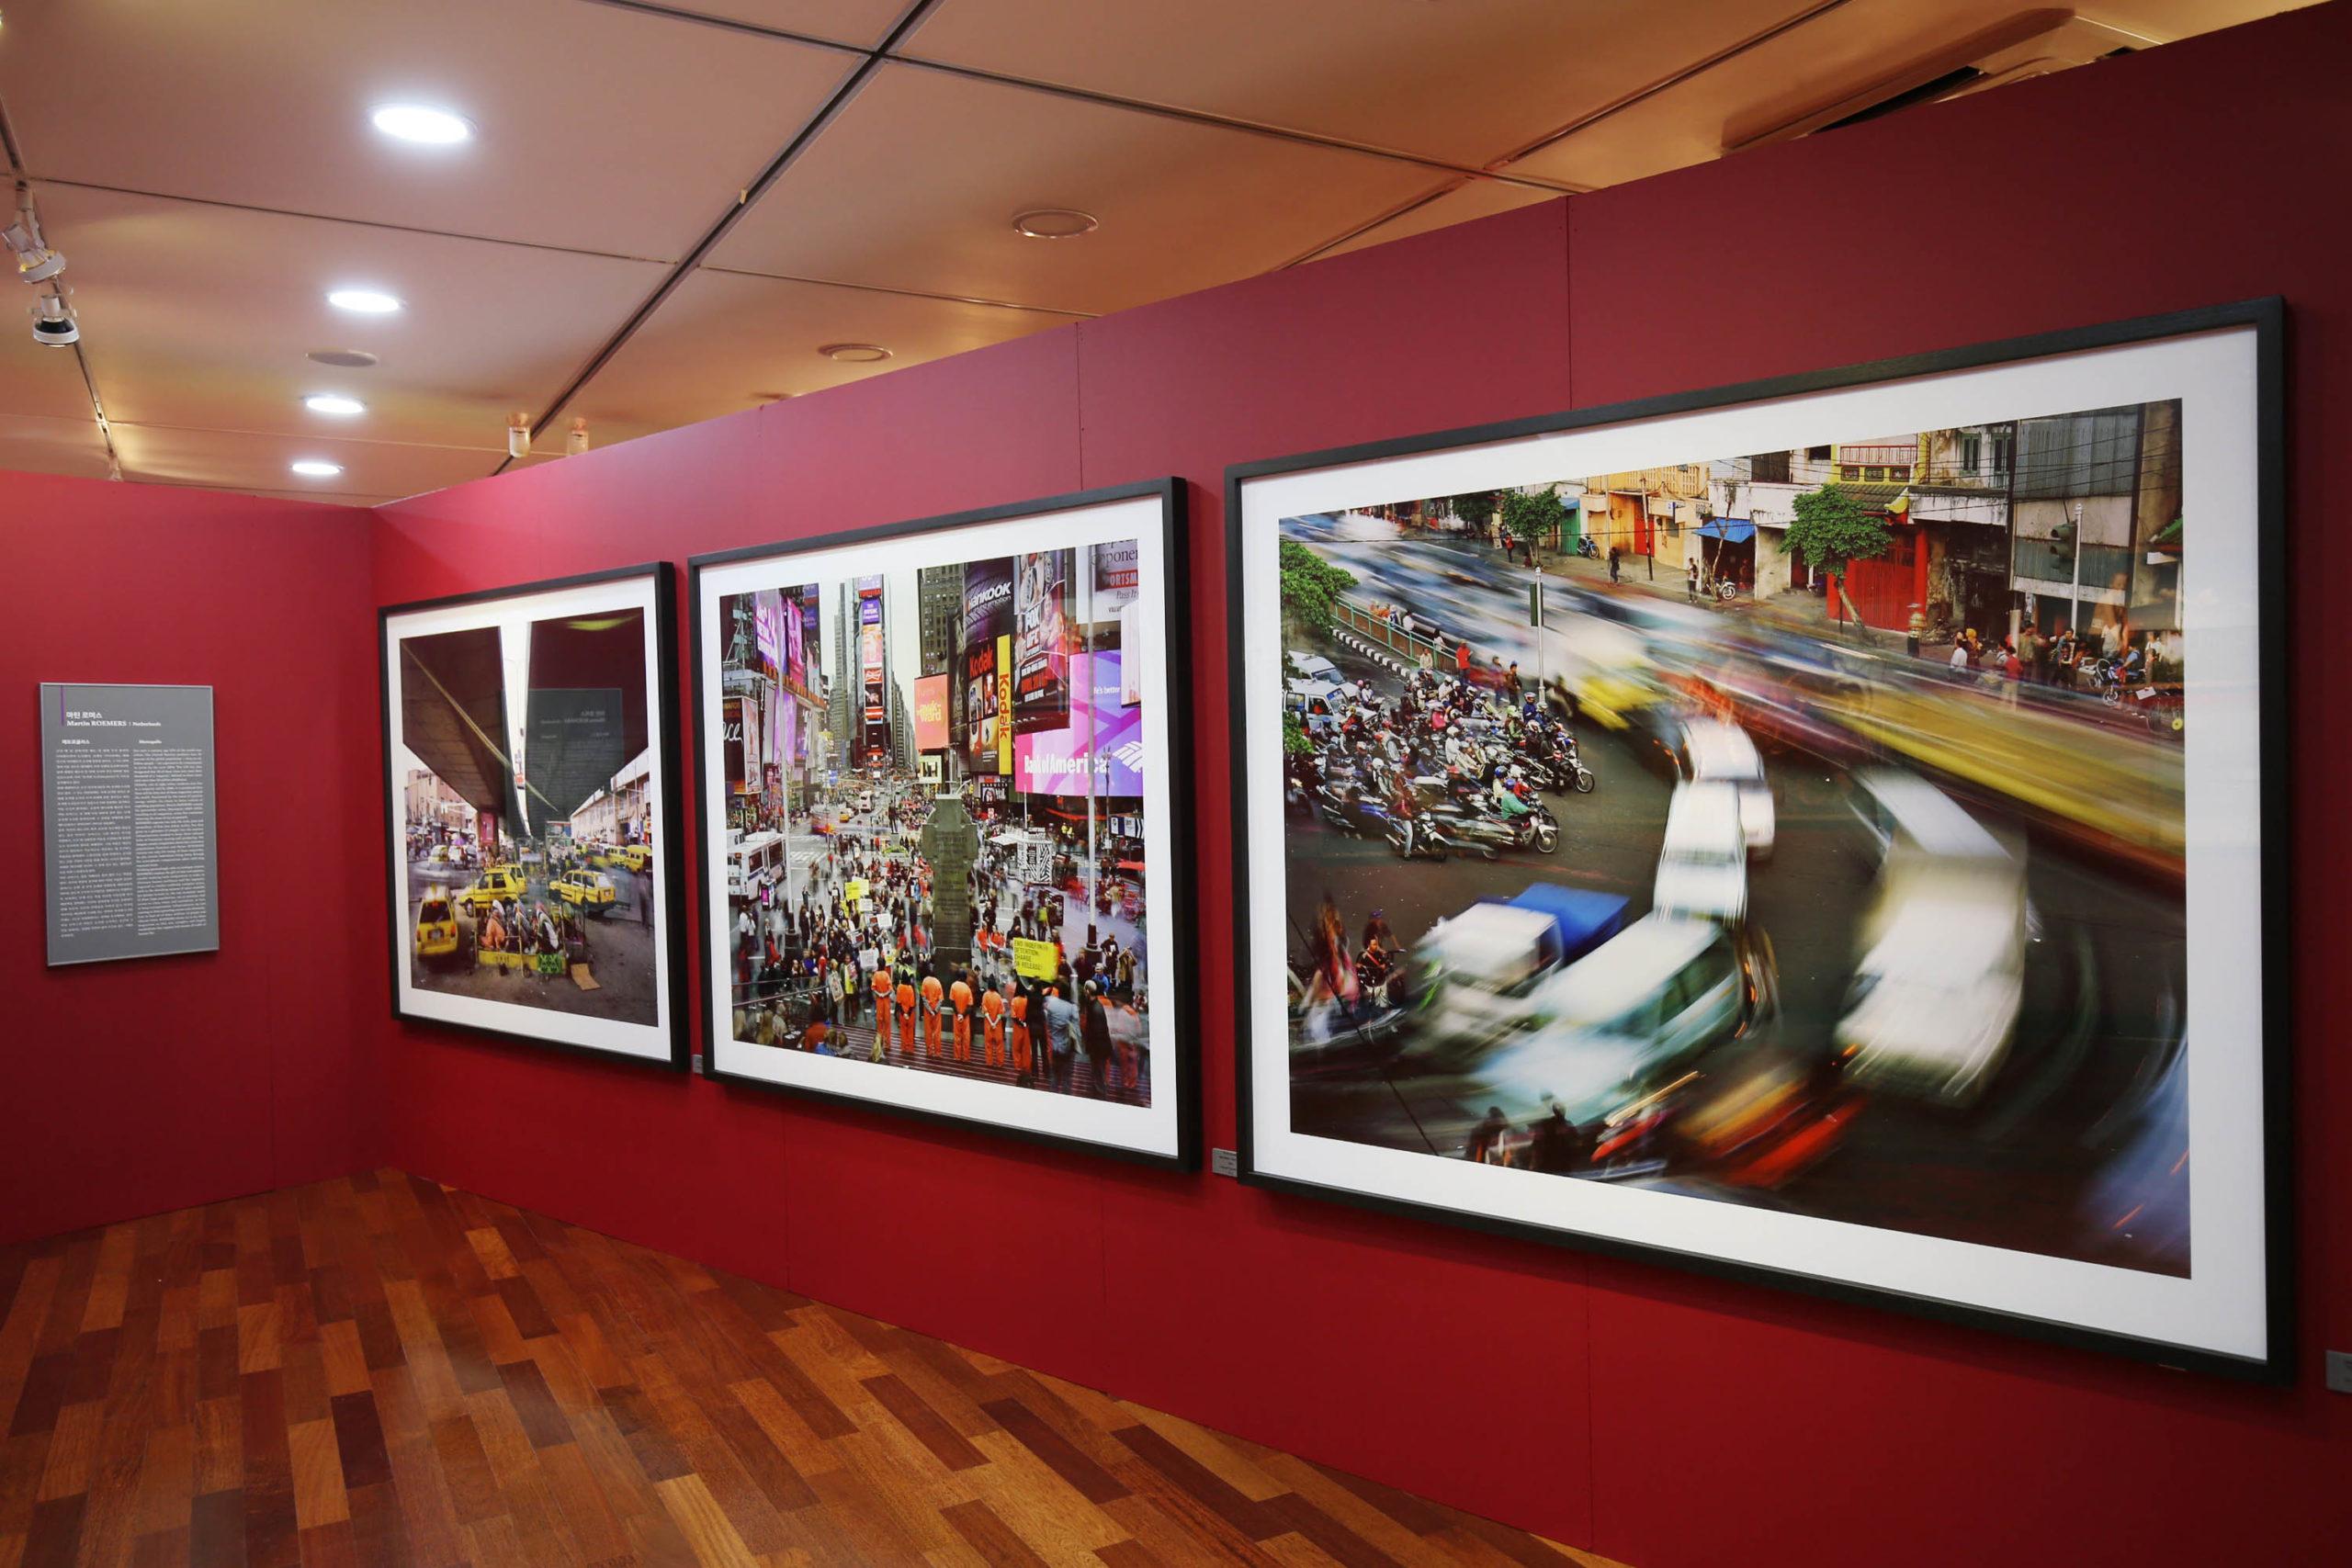 DongGang Museum of Photography, Yeongwol, South Korea